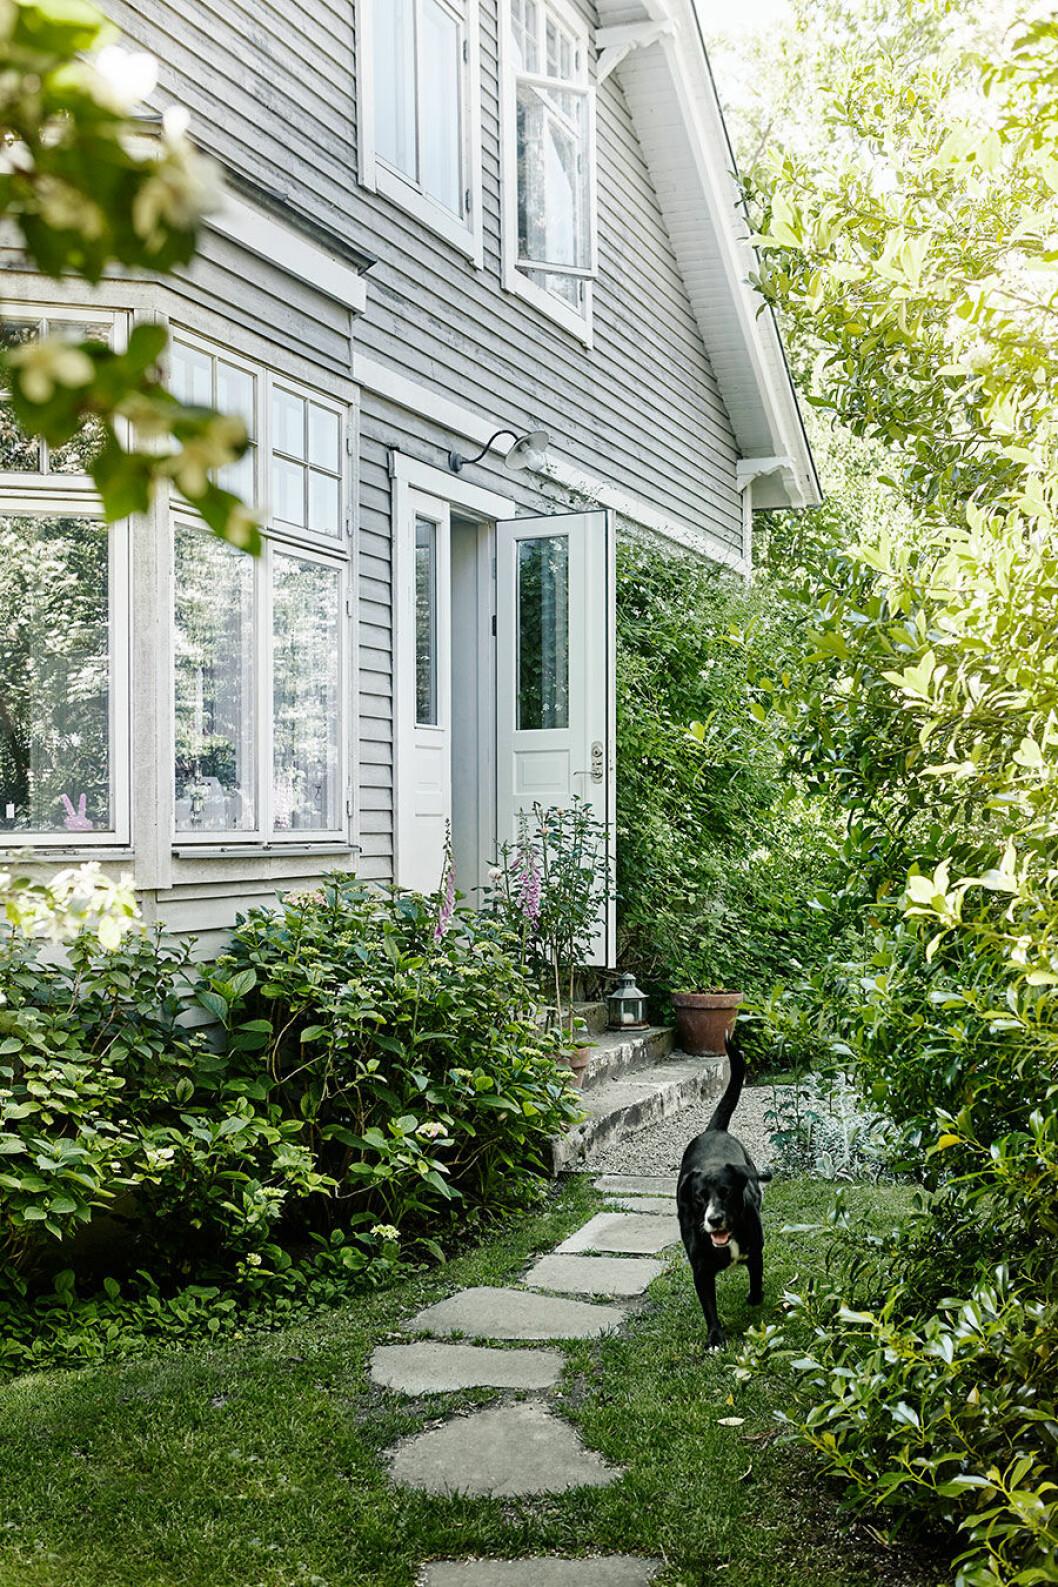 Rosengarden_garden_tradgard_exterior_gray_house_Foto_Petra_Bindel